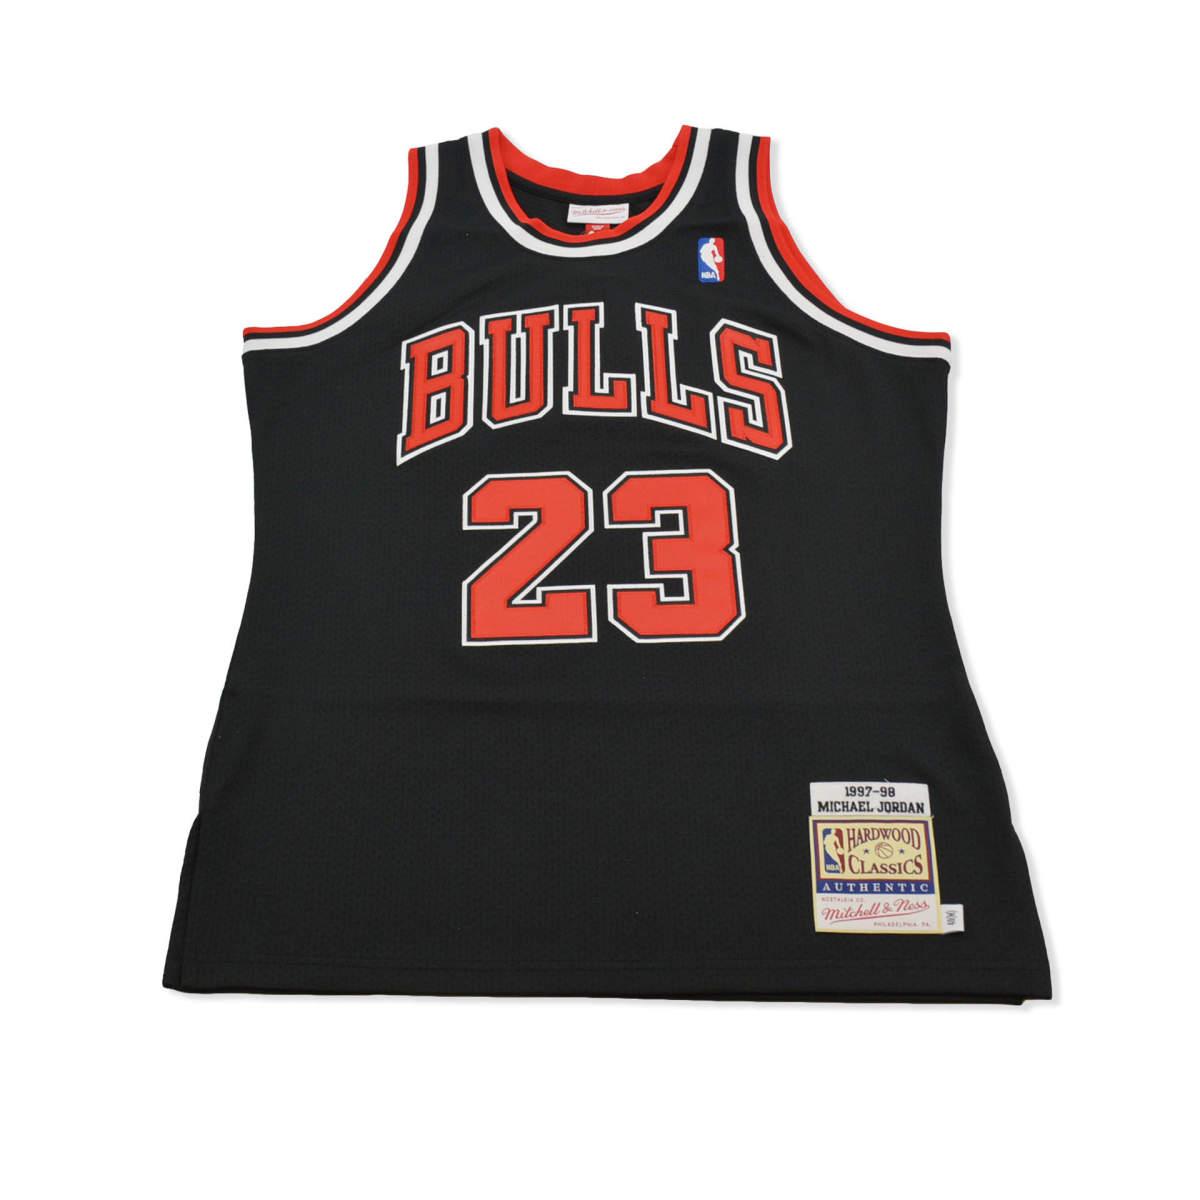 Chicago bulls alternate authentic jersey jordan 1997-98